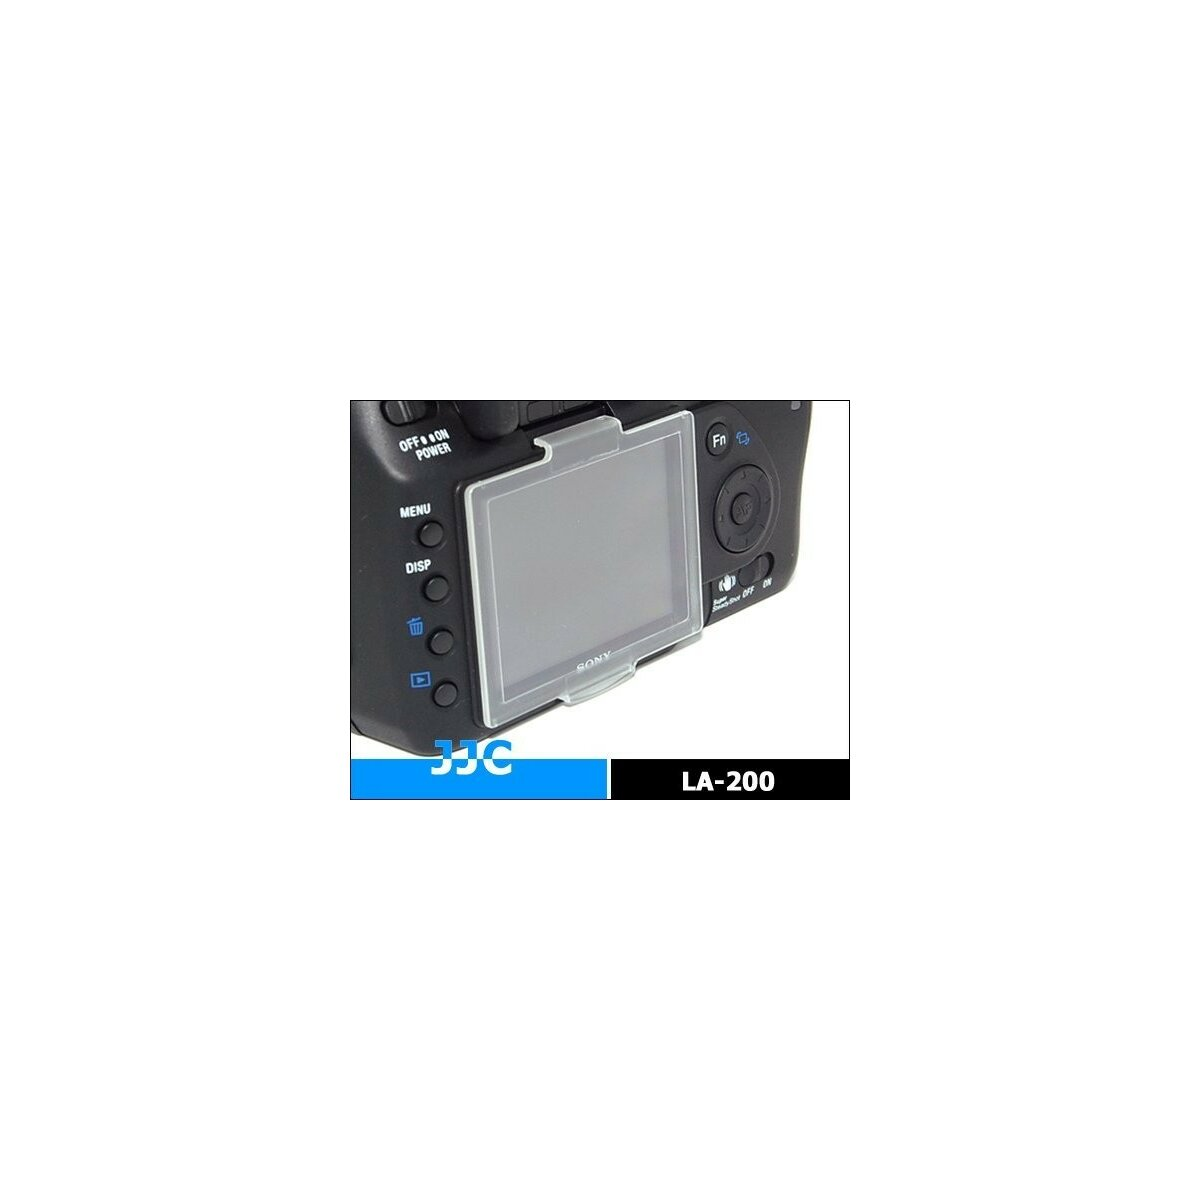 Monitorschutzkappe fuer Sony A200 wie PCK-LH2AM